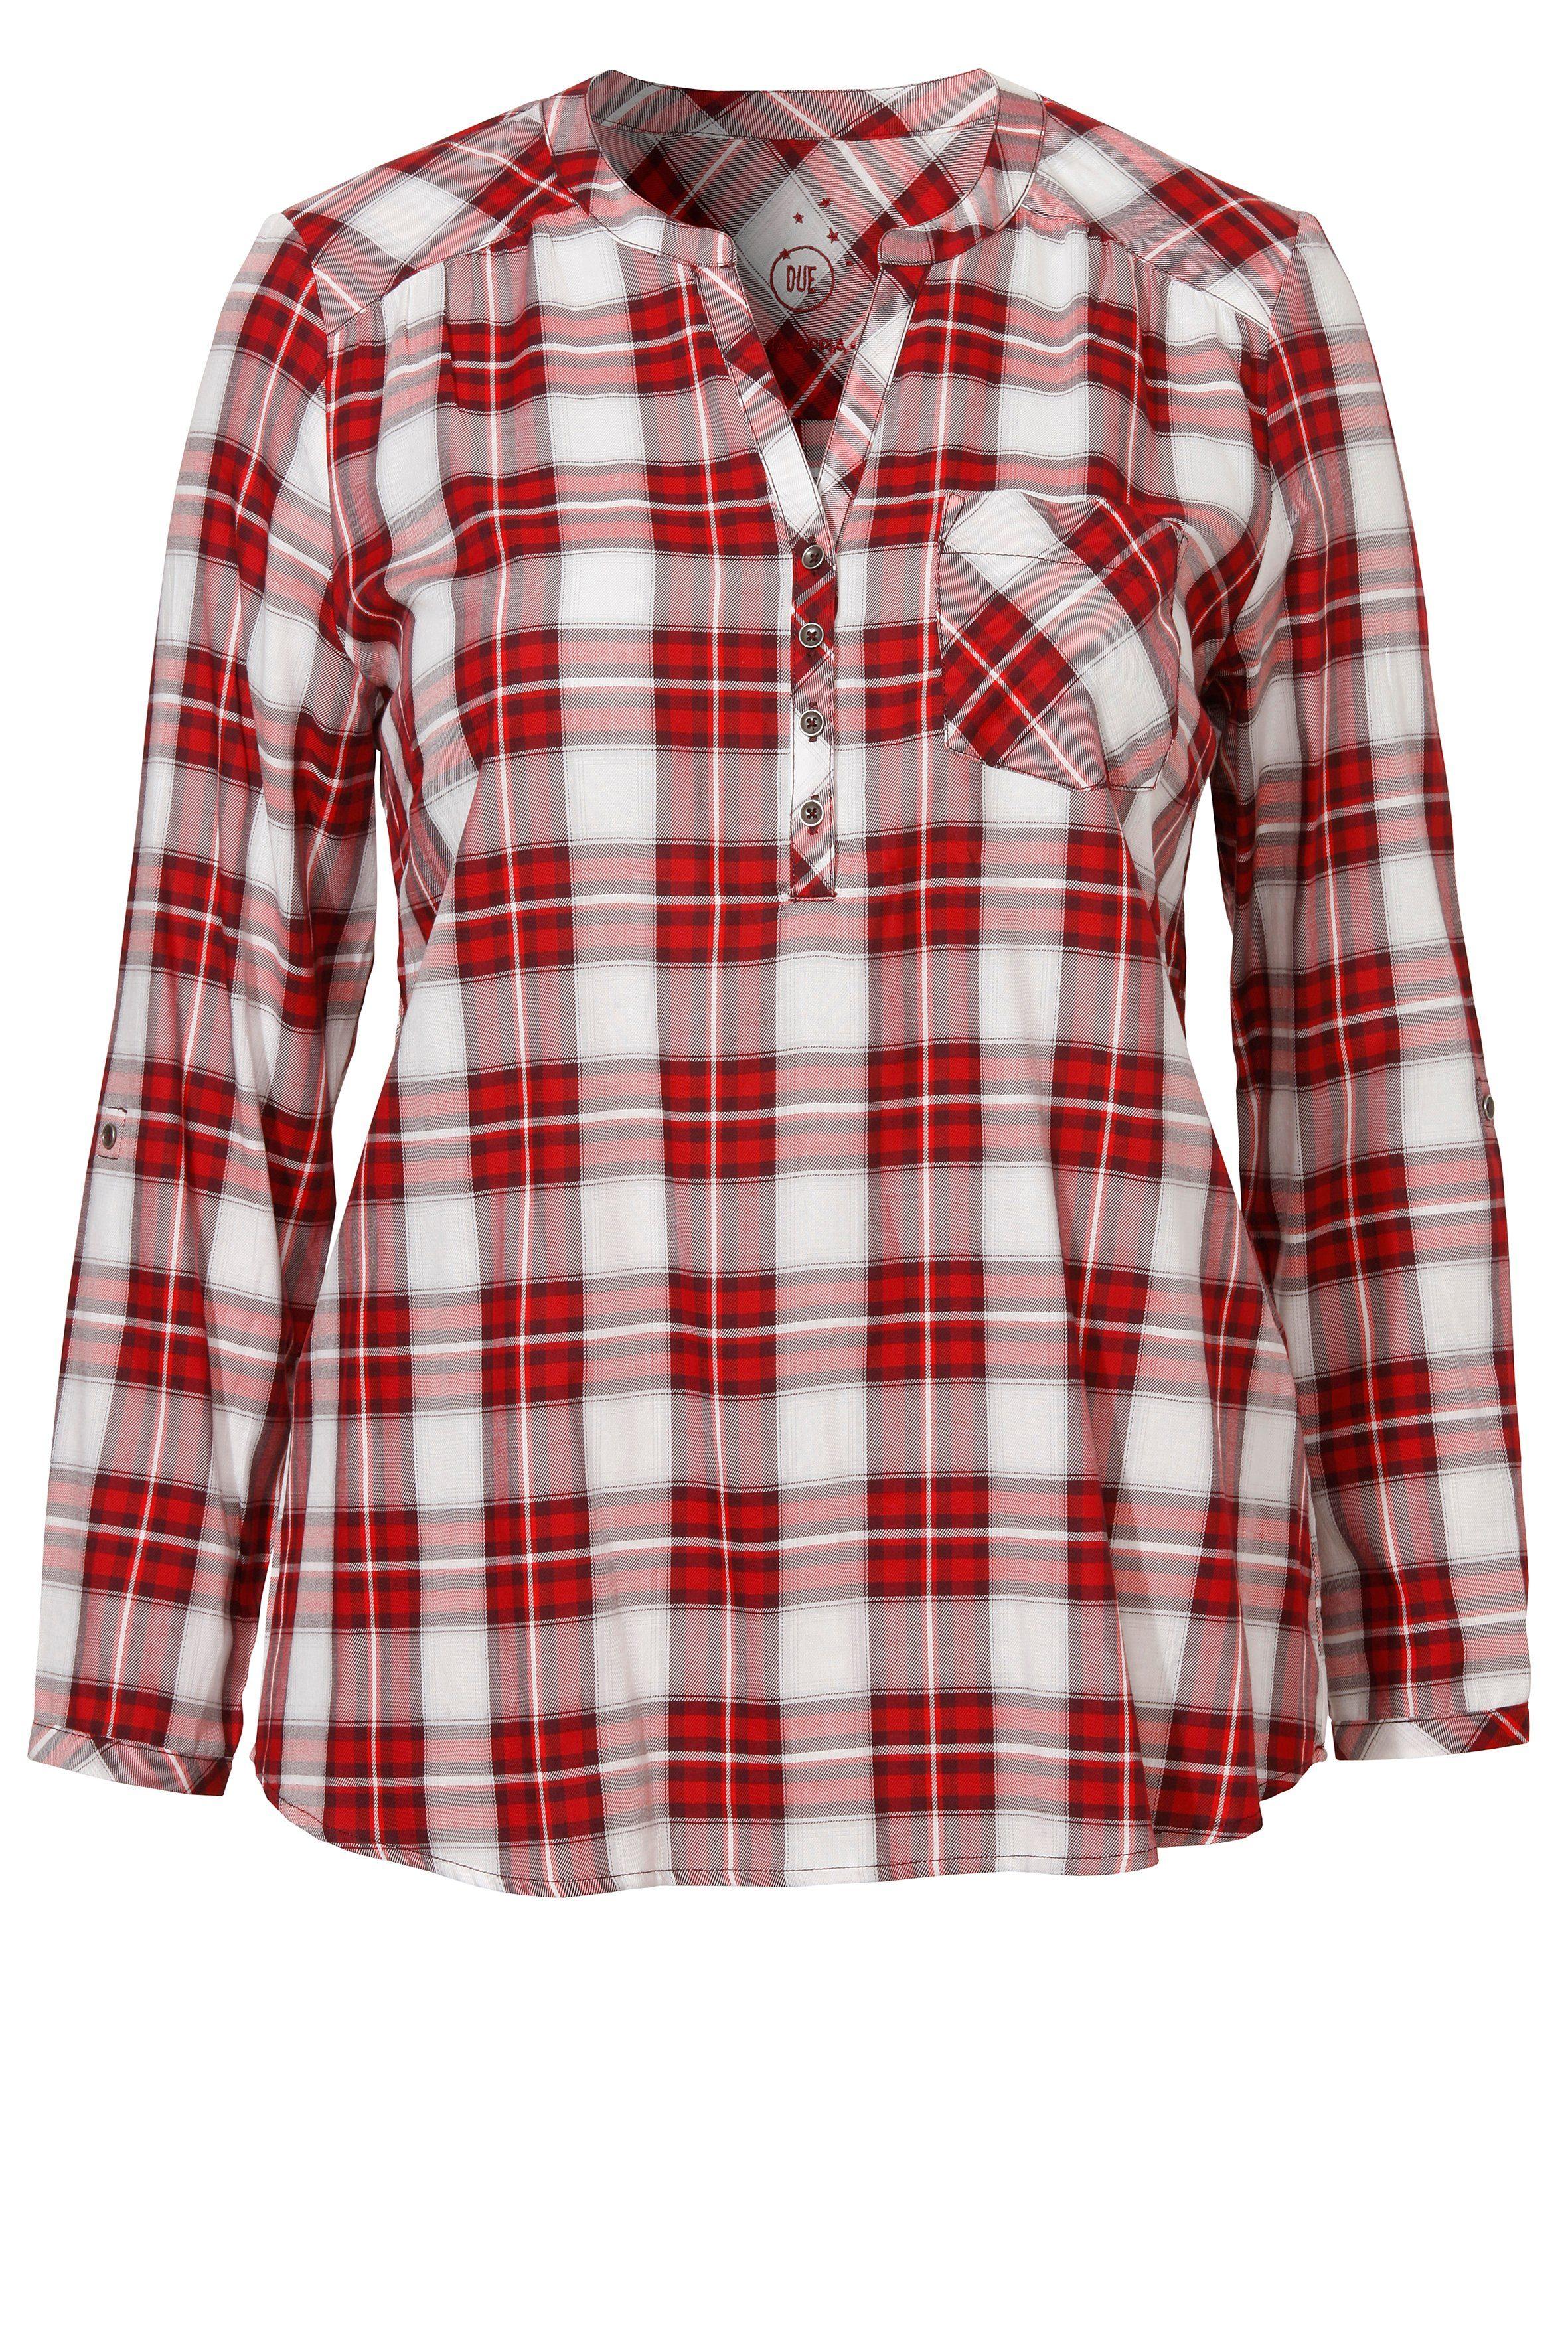 VIA APPIA DUE Süße Bluse mit Karo-Muster